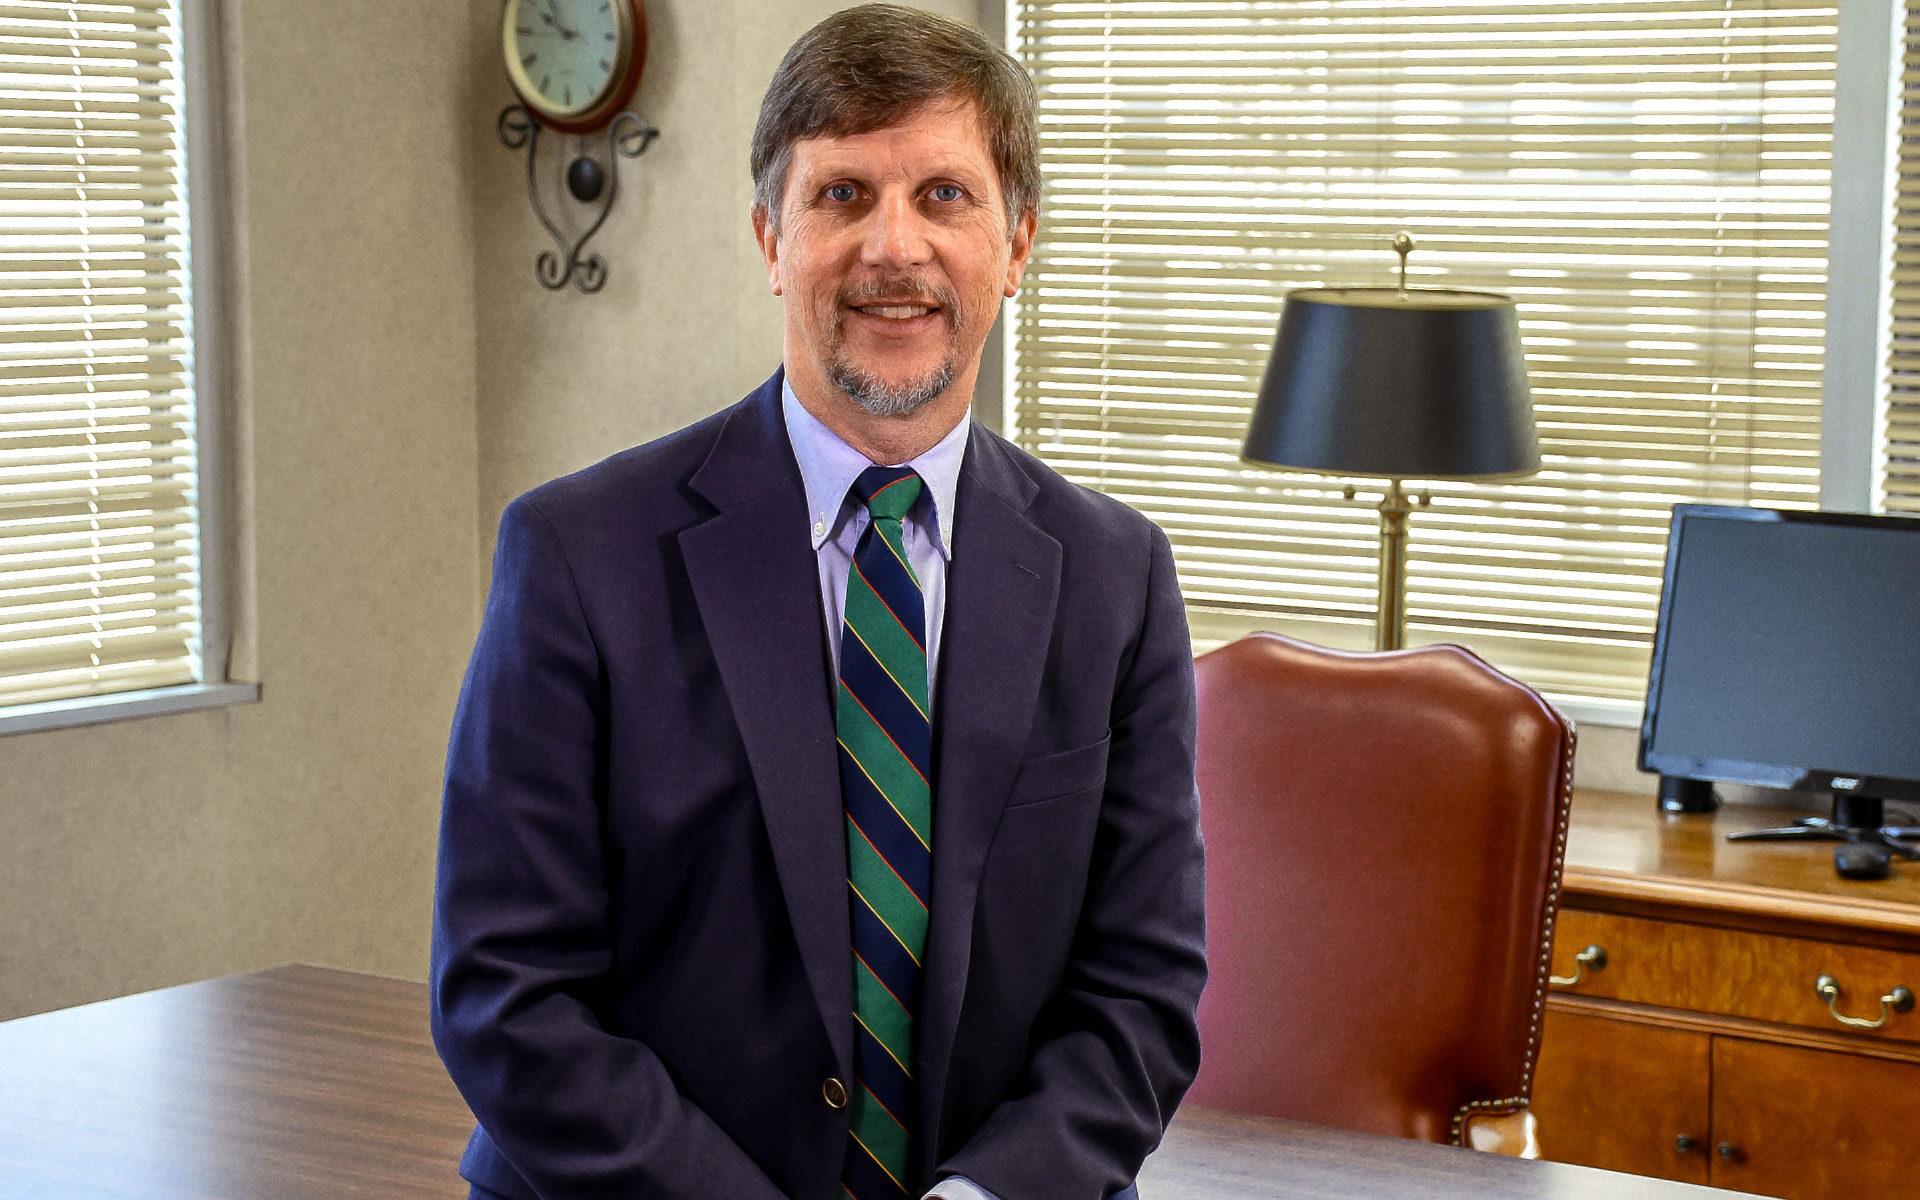 David S. Barbee